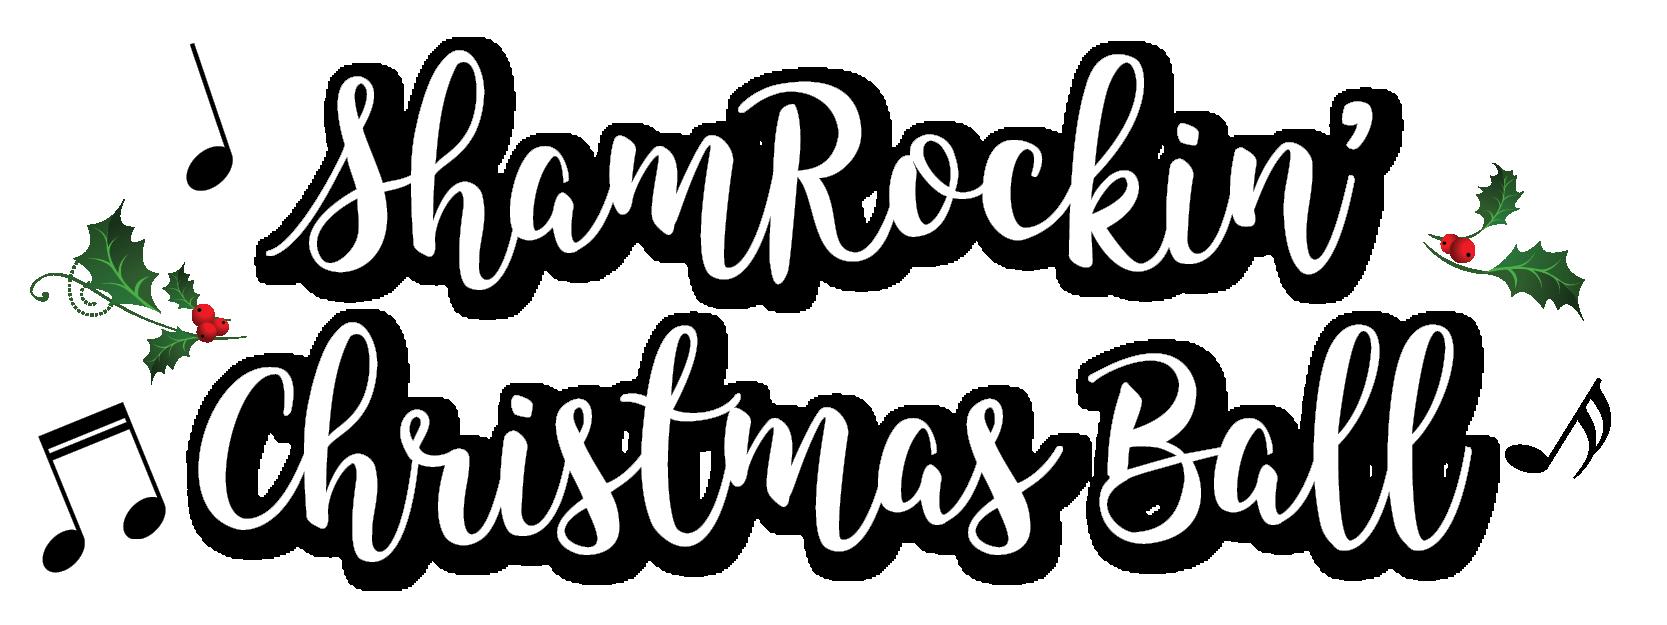 ShamRockin' Christmas Ball